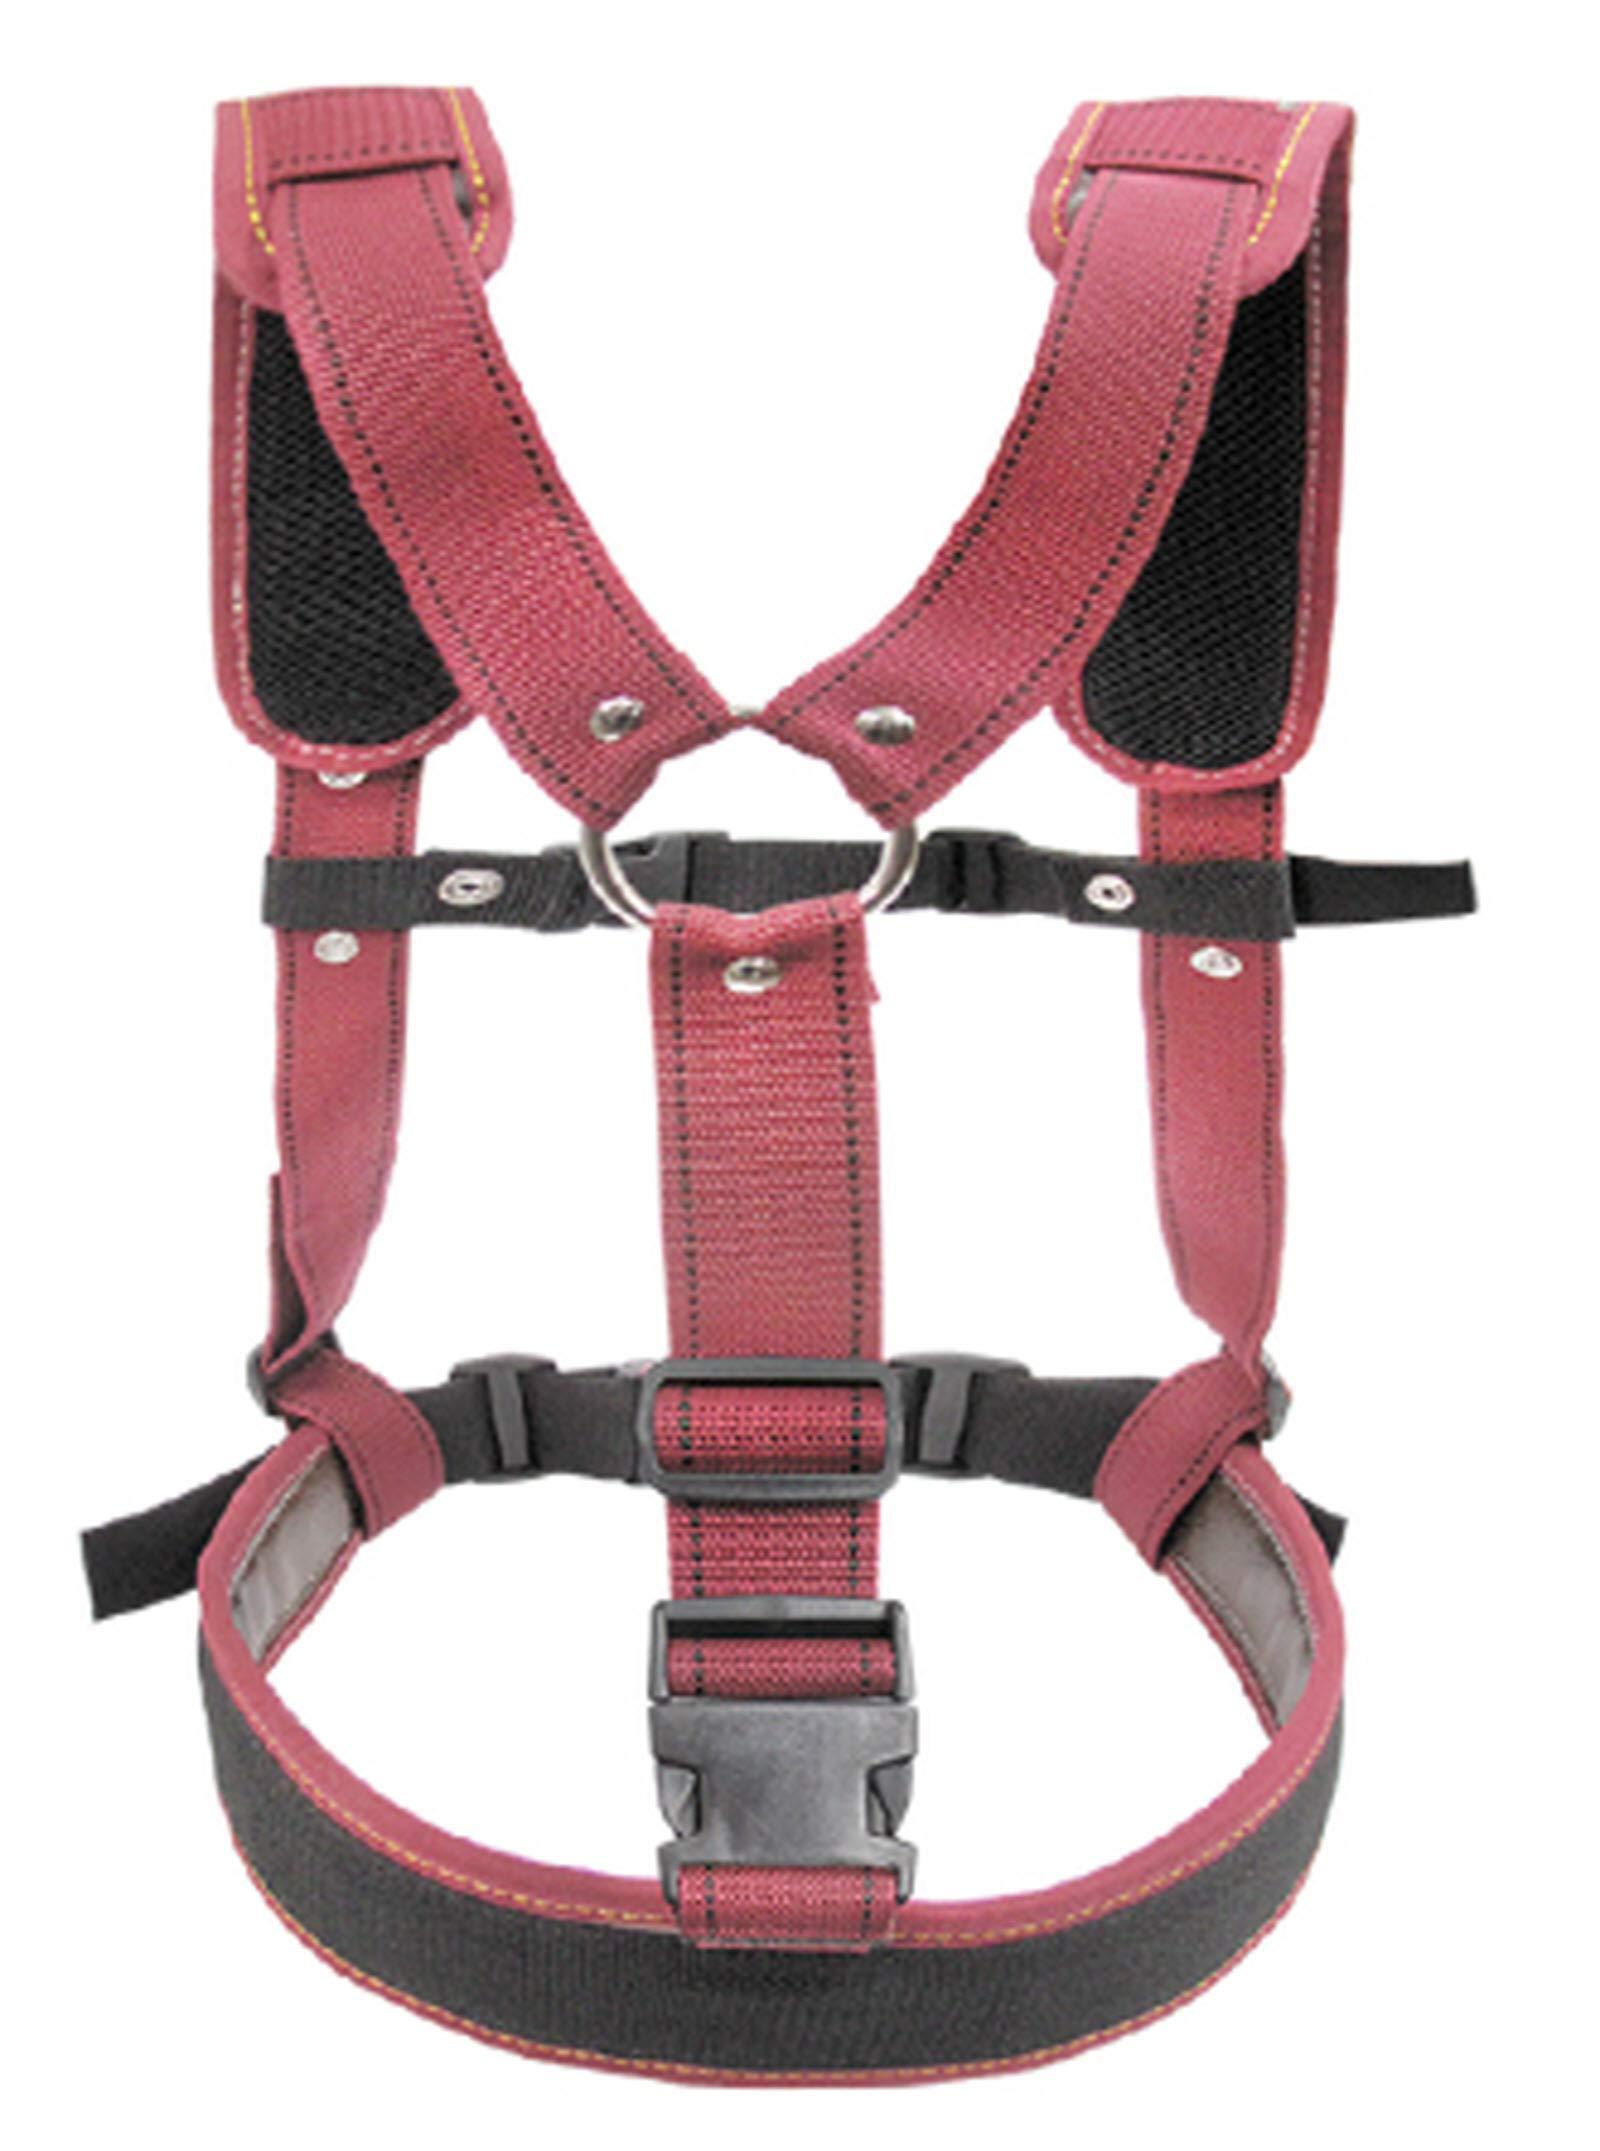 KAYA KL- 210 Carpenter Work Tool Belt Suspenders Support Adjustable Length by KAYA (Image #2)